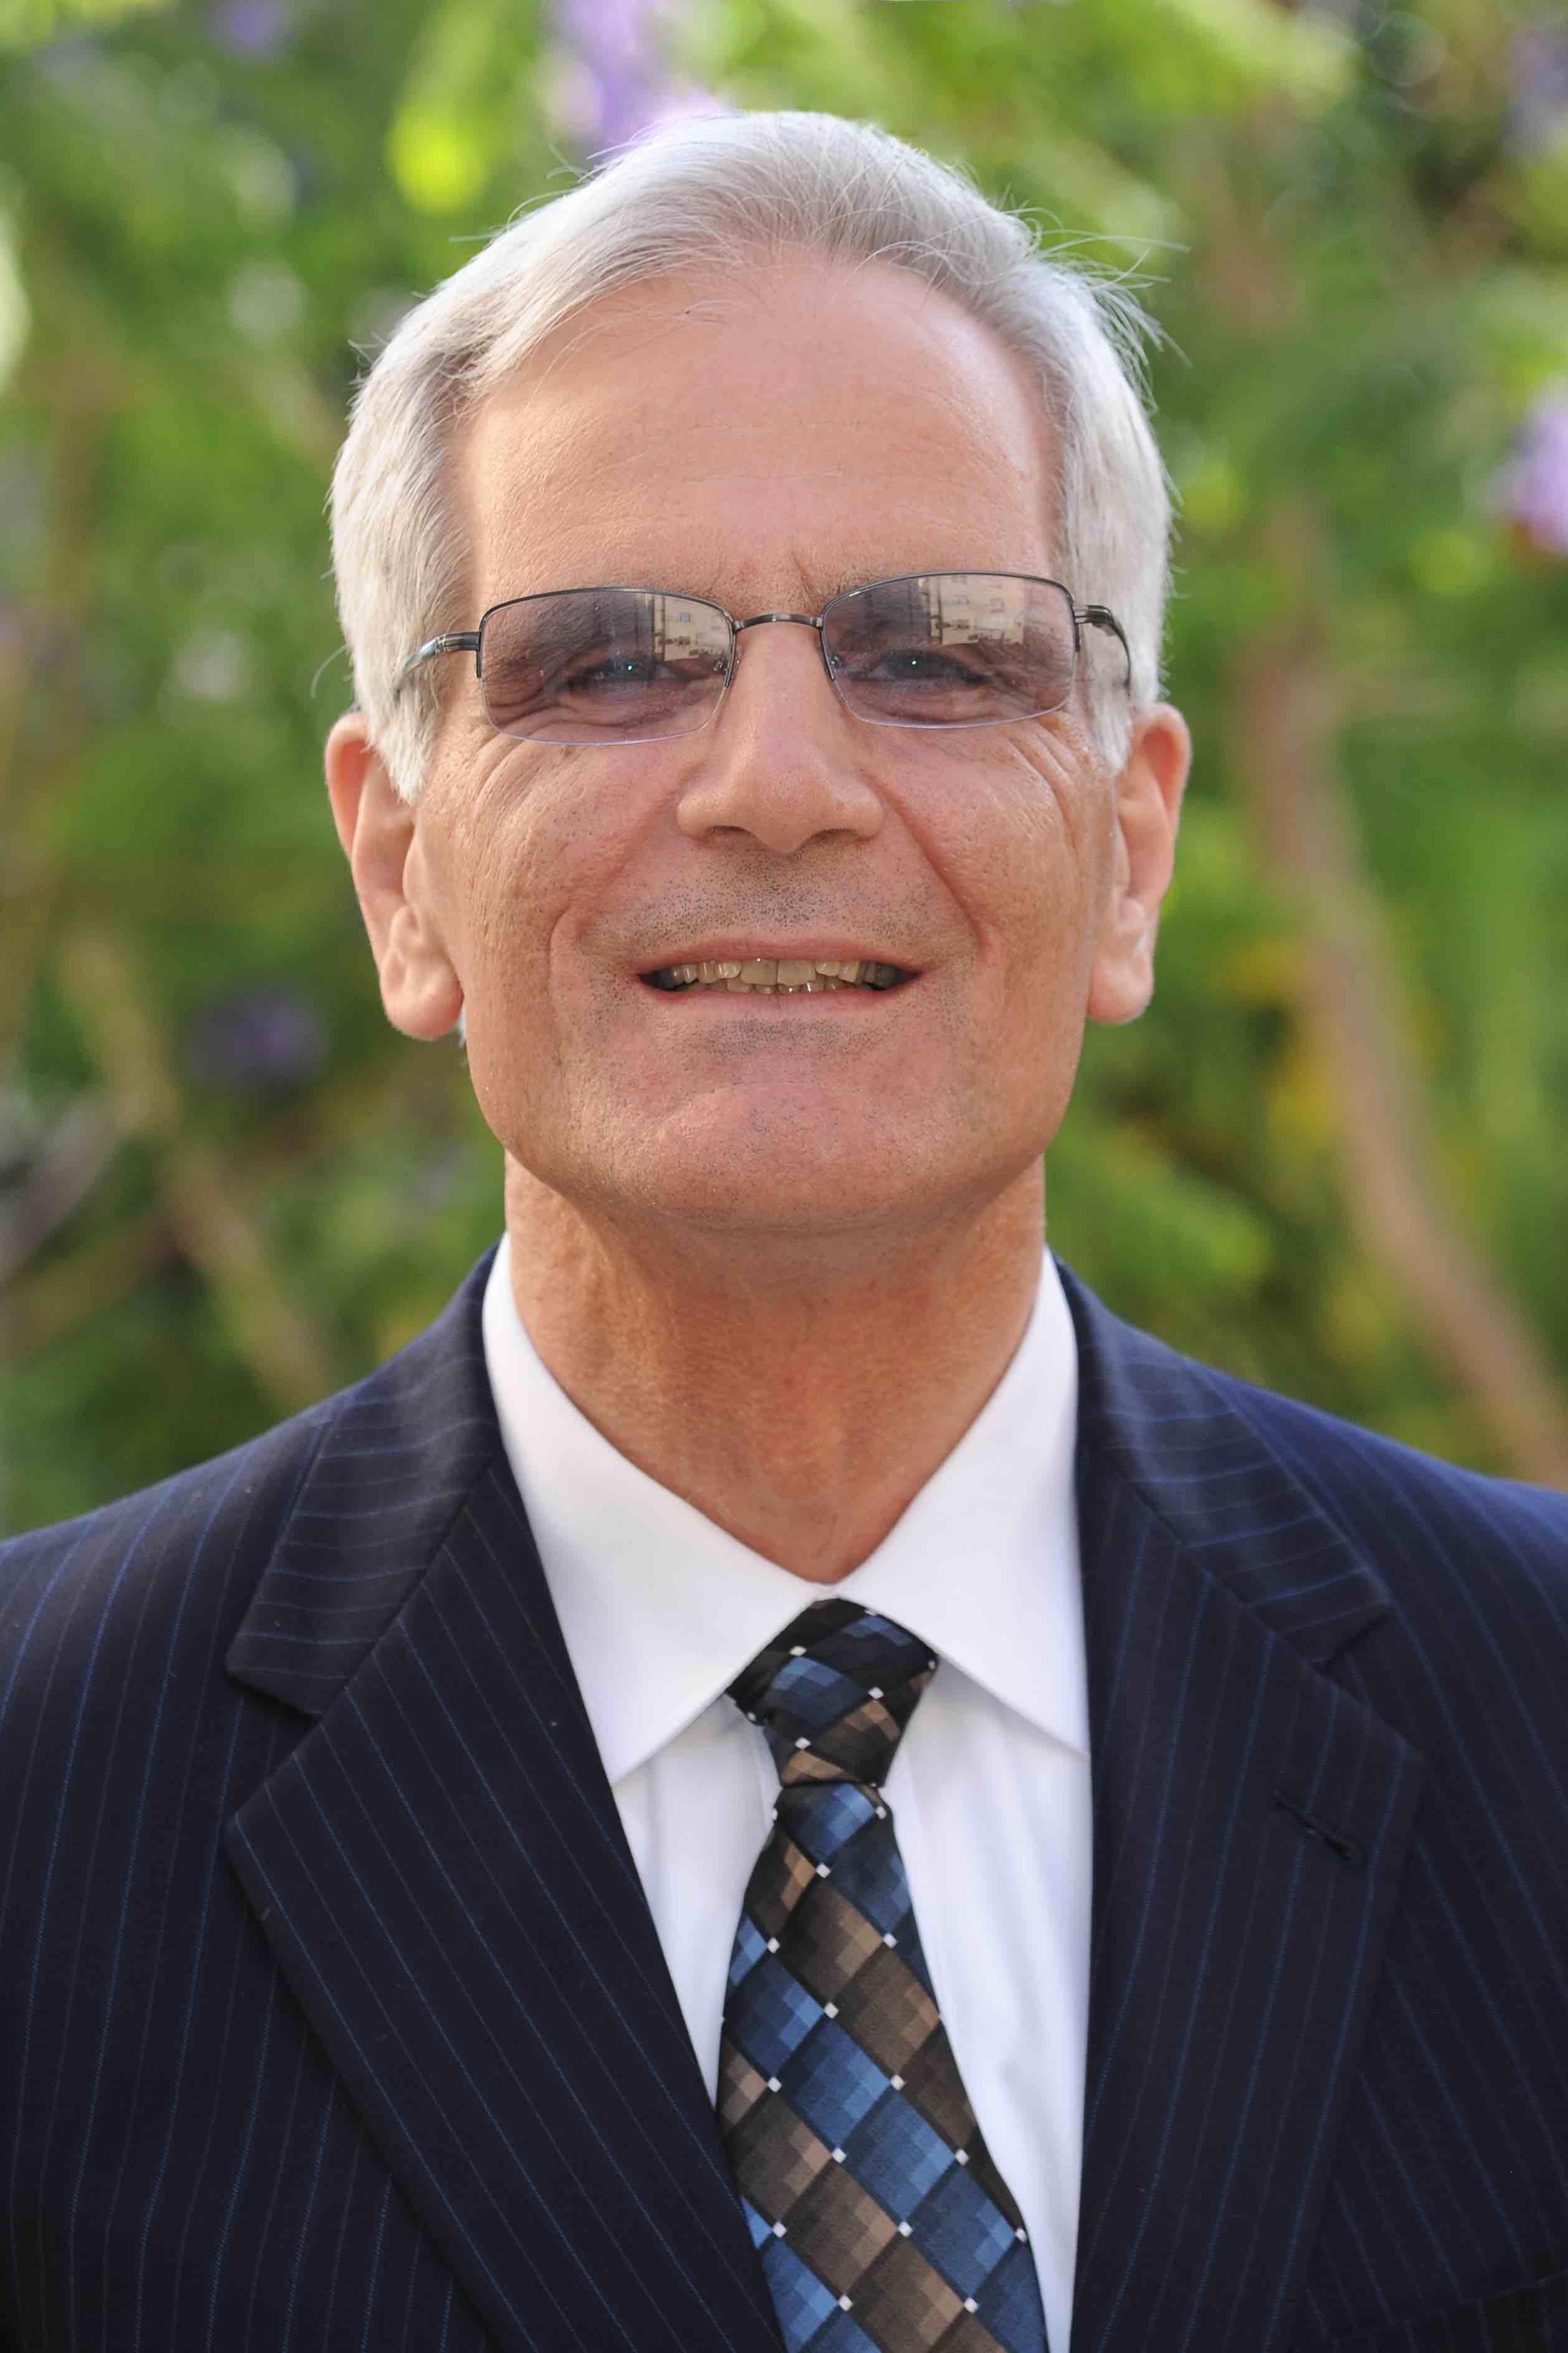 Dr. Imad Shehadeh